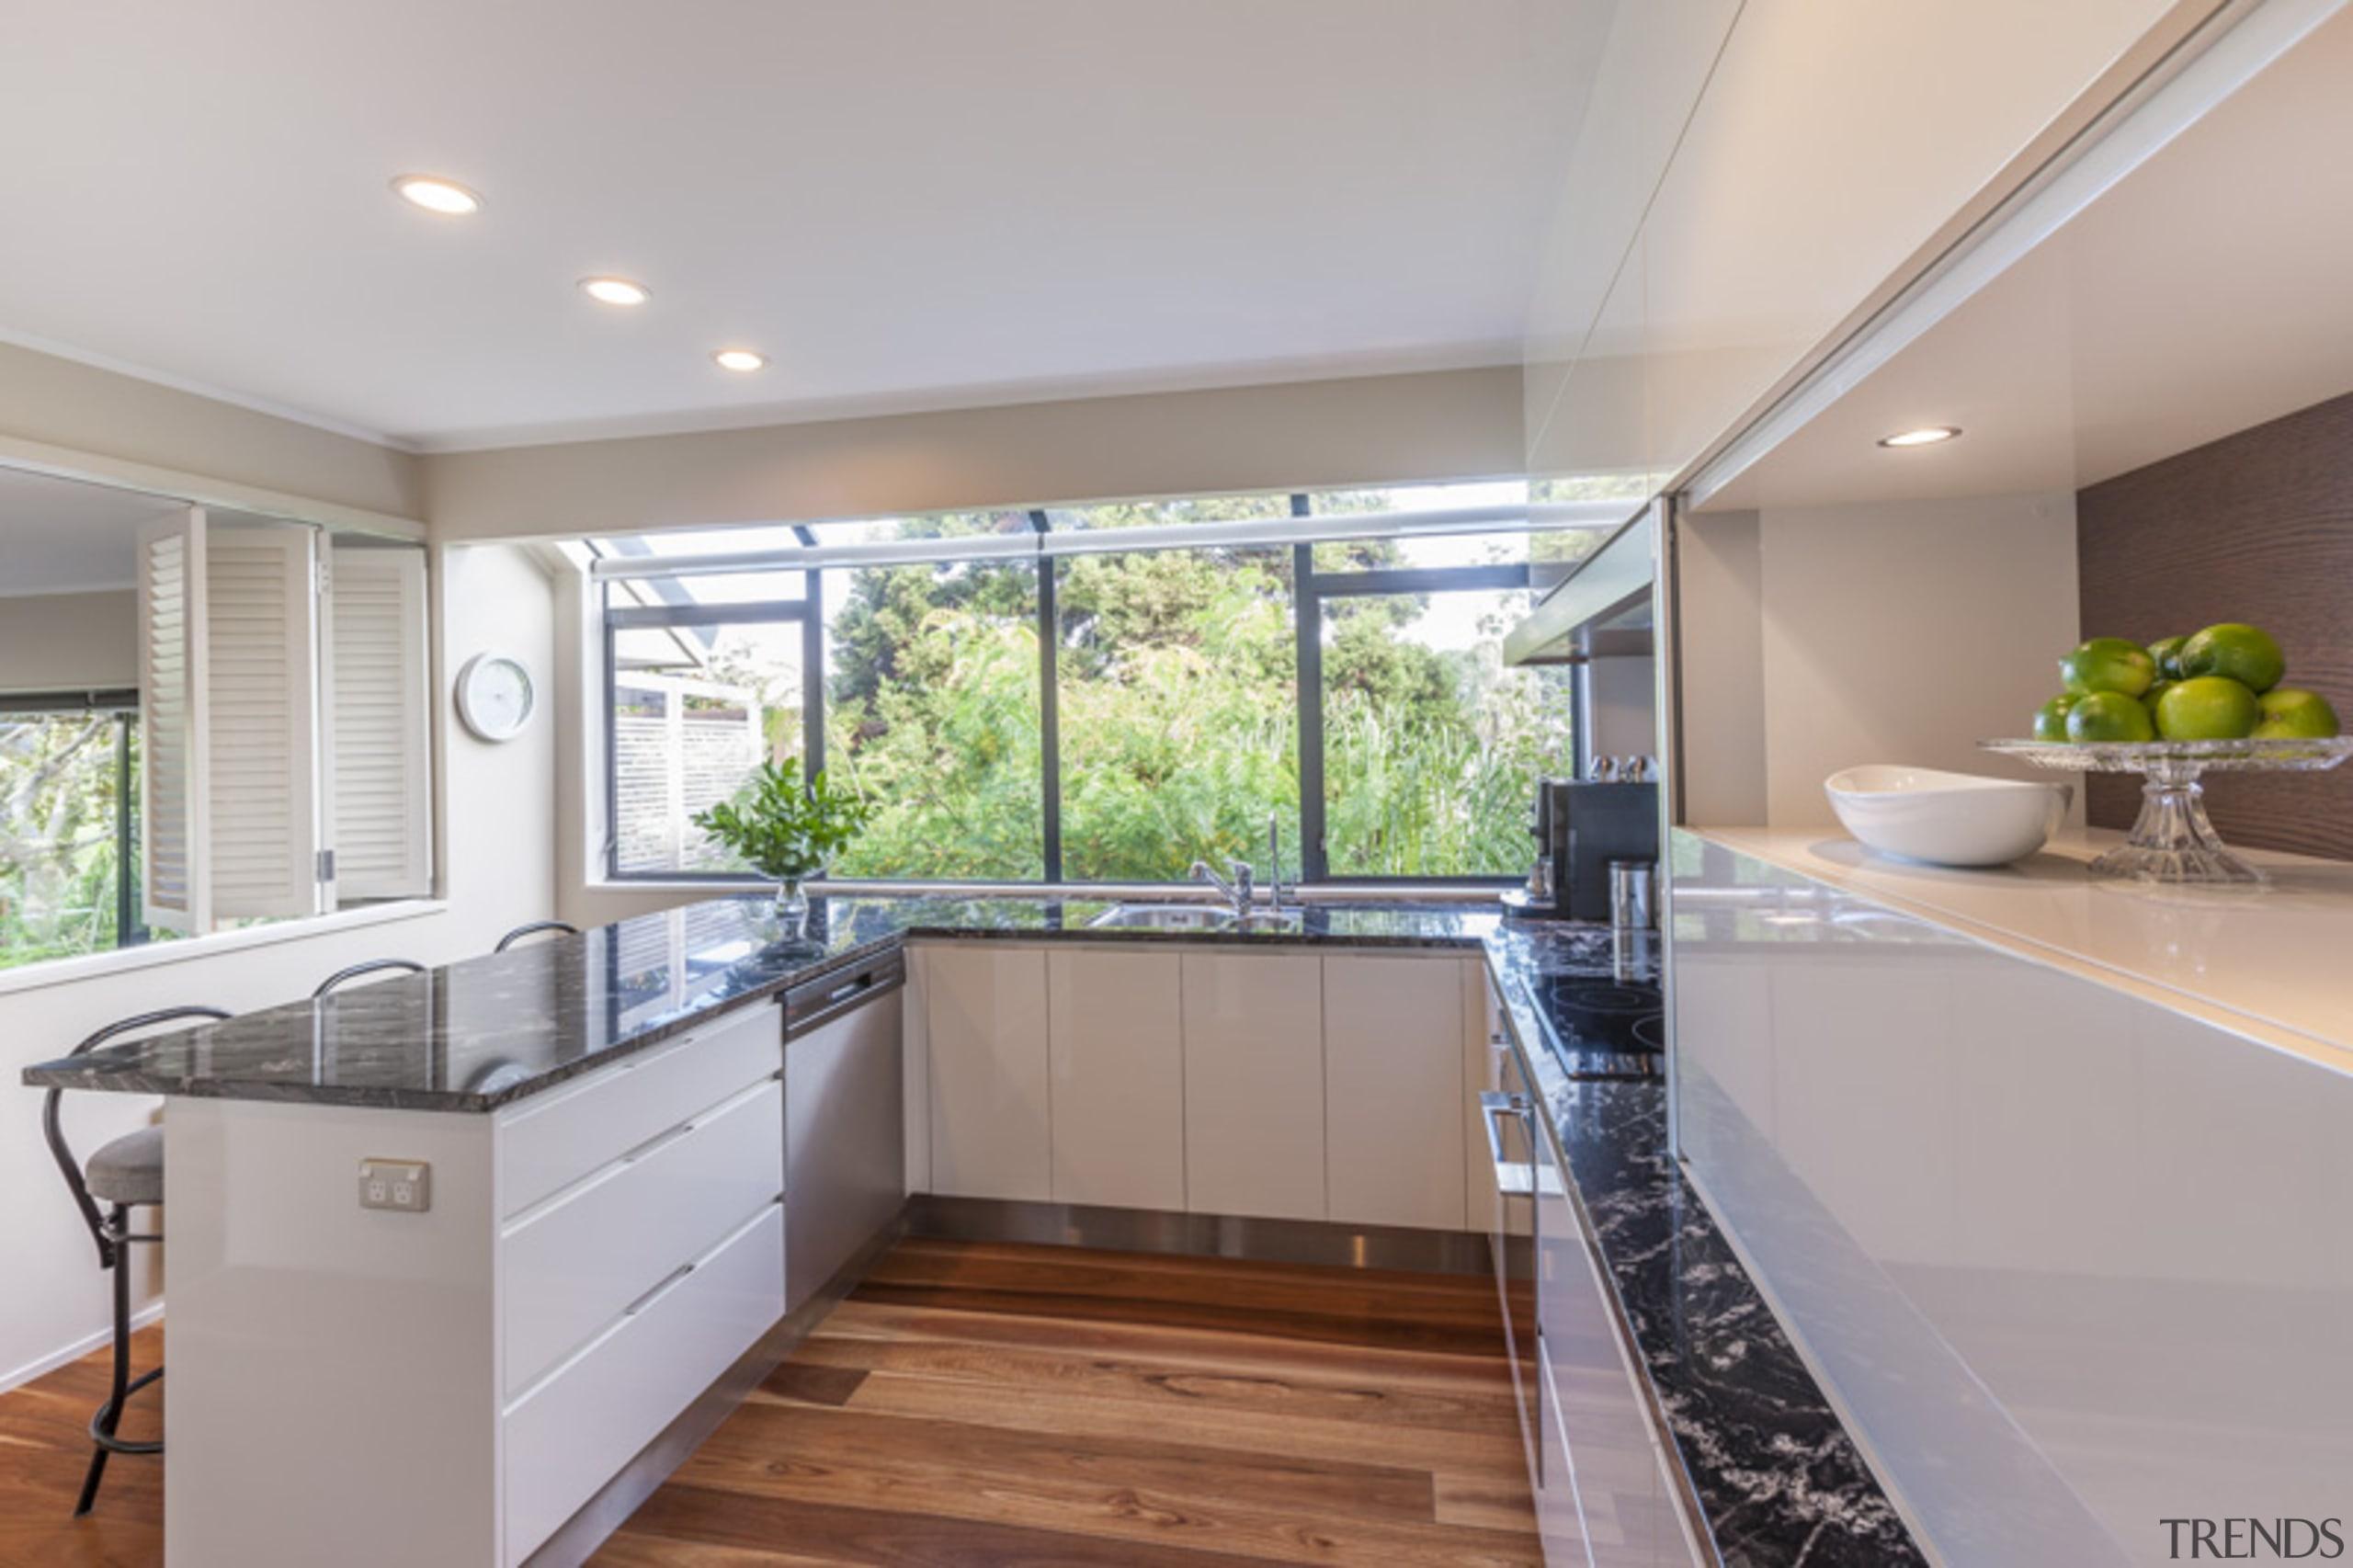 St. Heliers II - countertop | daylighting | countertop, daylighting, estate, house, interior design, kitchen, property, real estate, window, gray